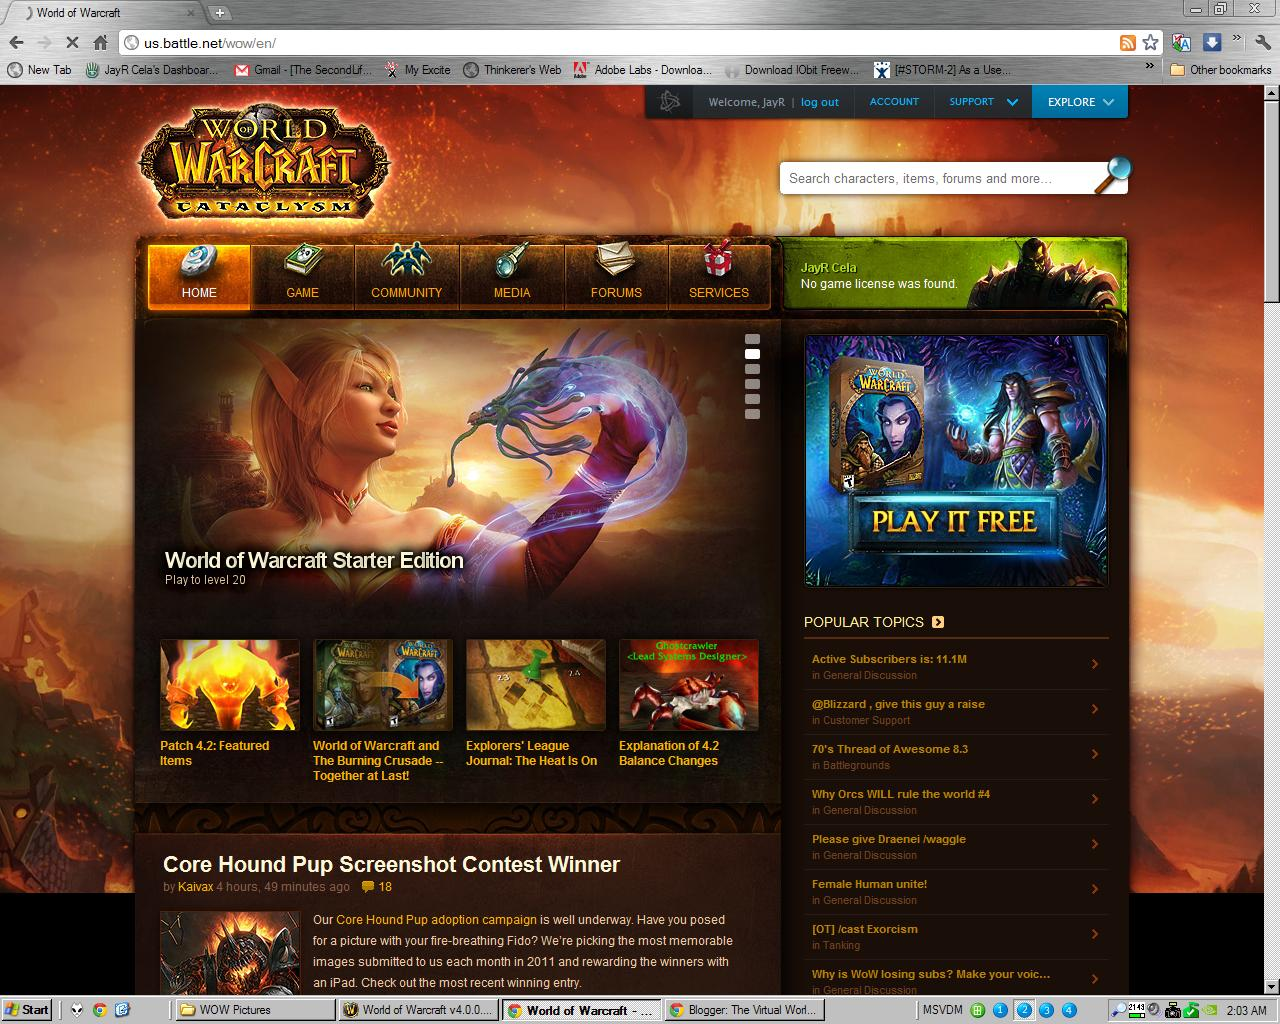 Blizzard Account - us.battle.net